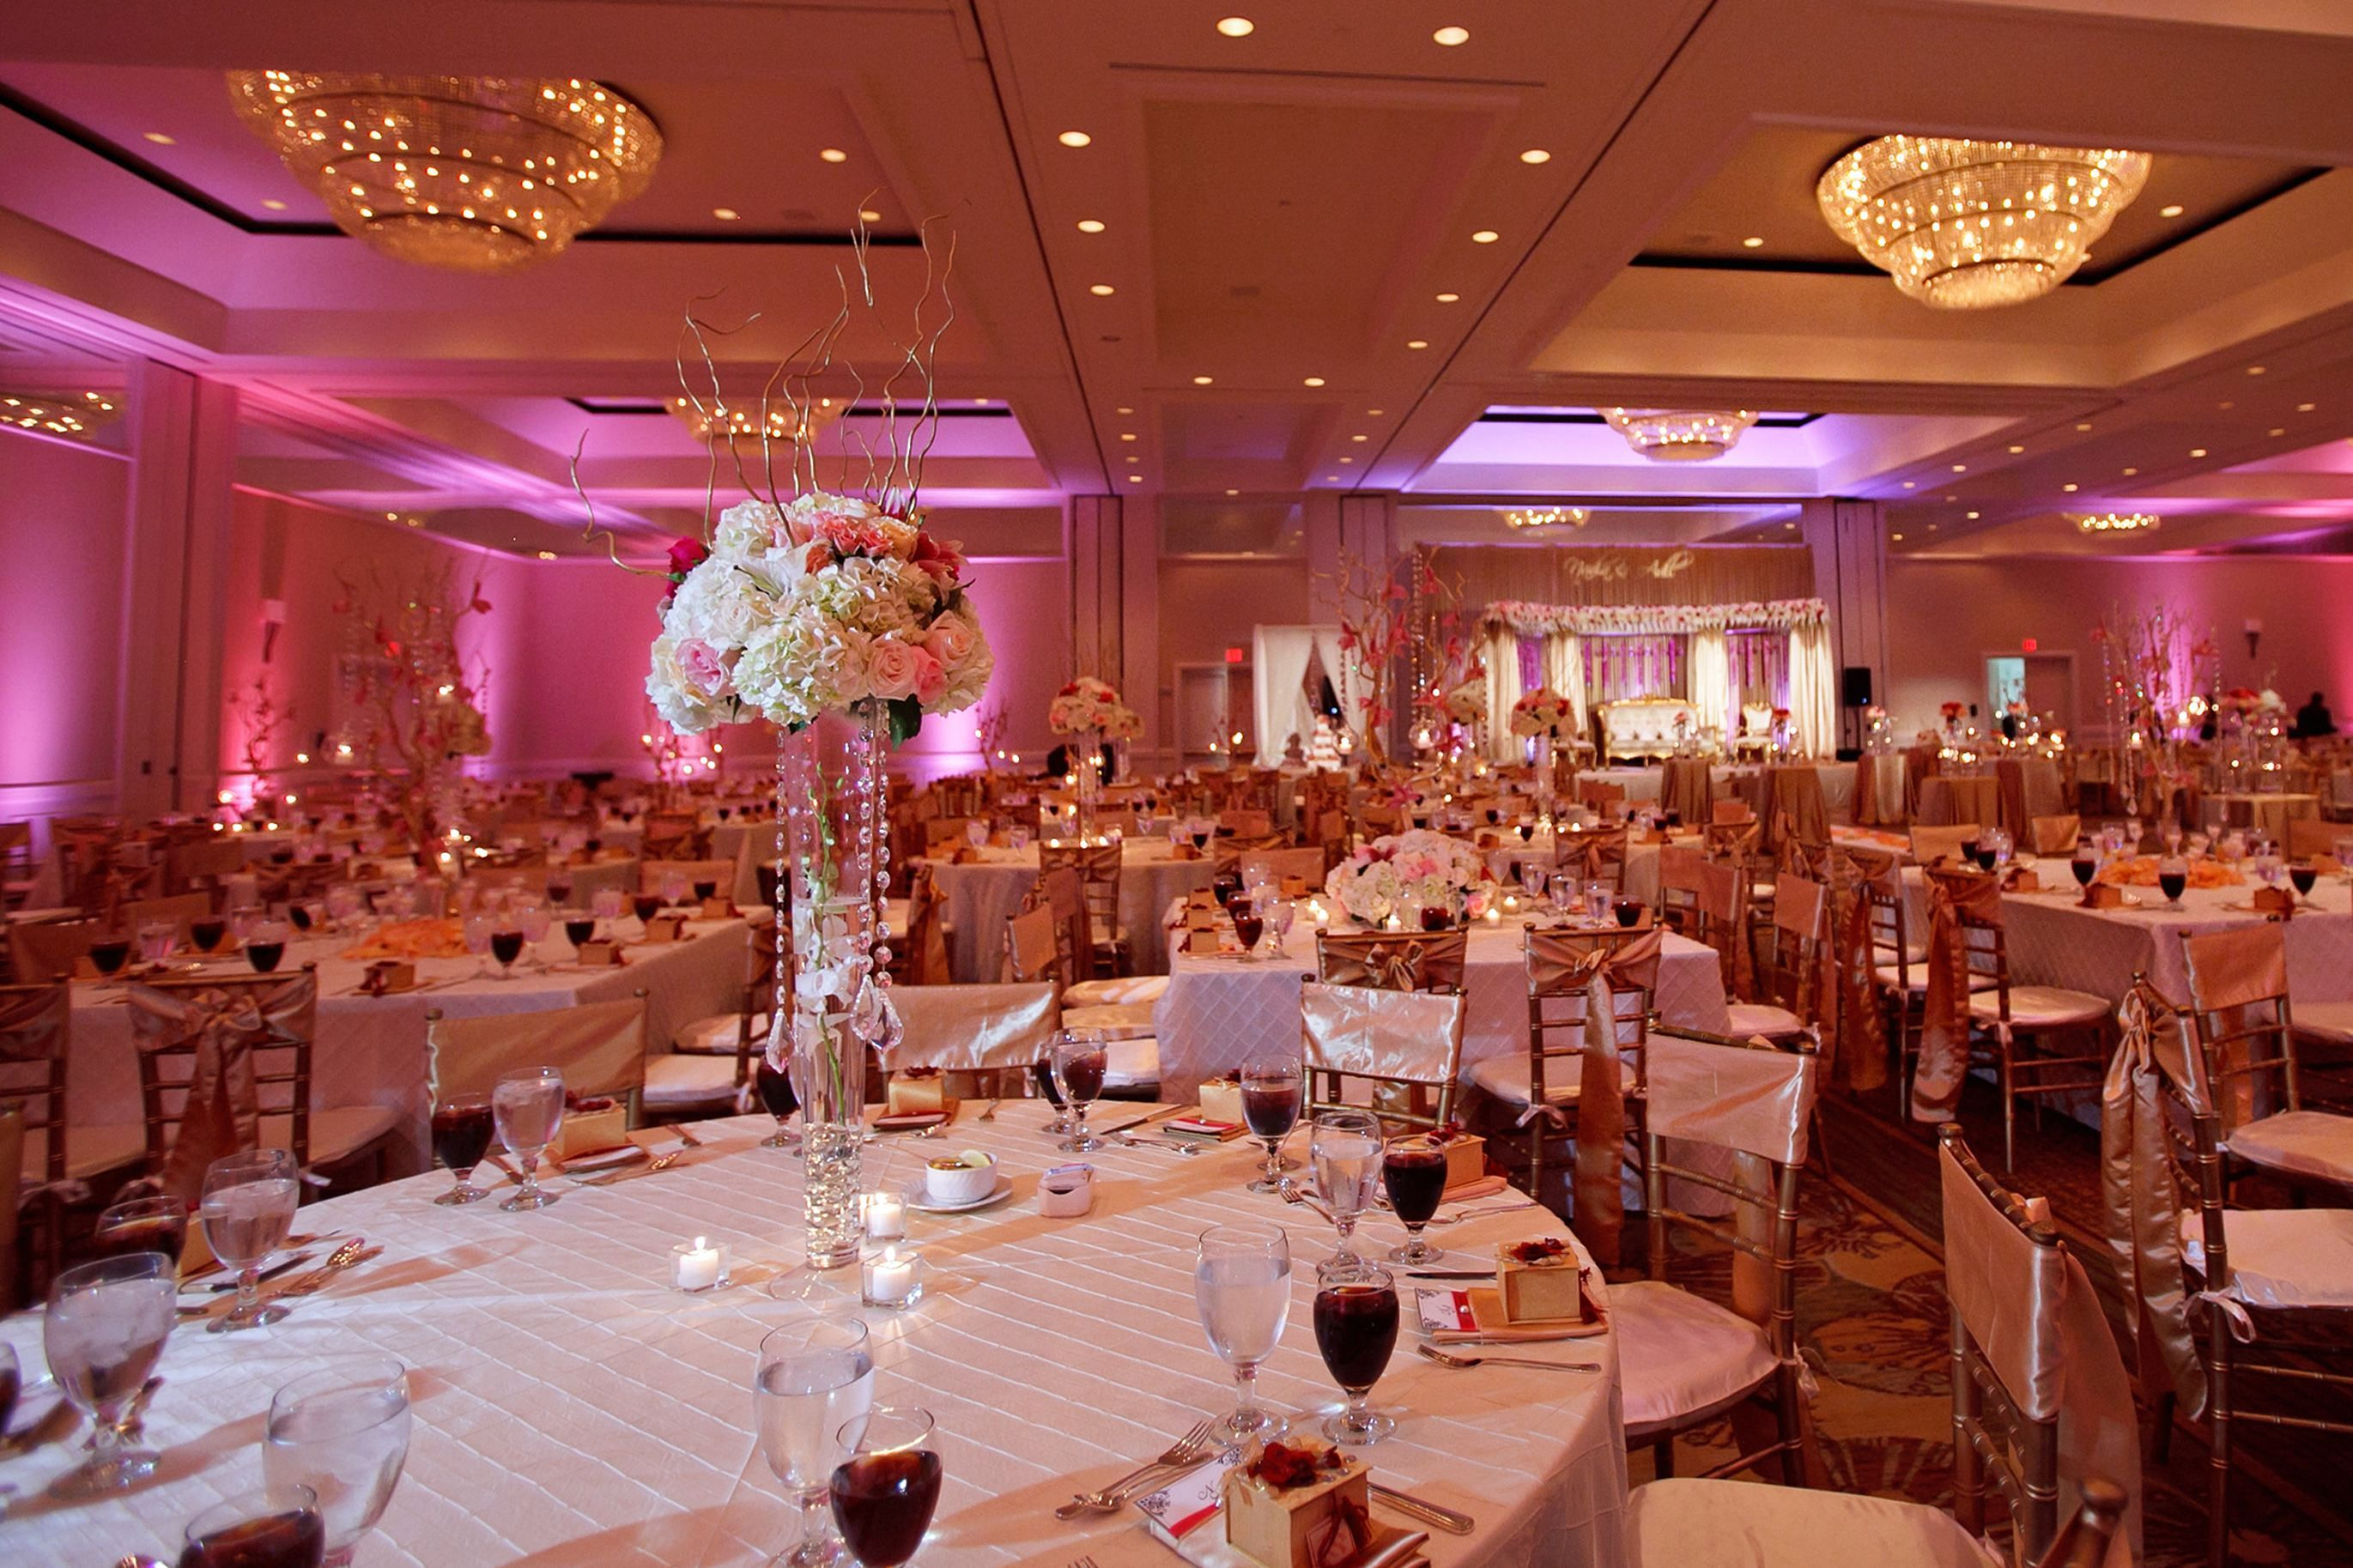 25 Unique Wedding Venue Design Ideas For Amazing Wedding Party